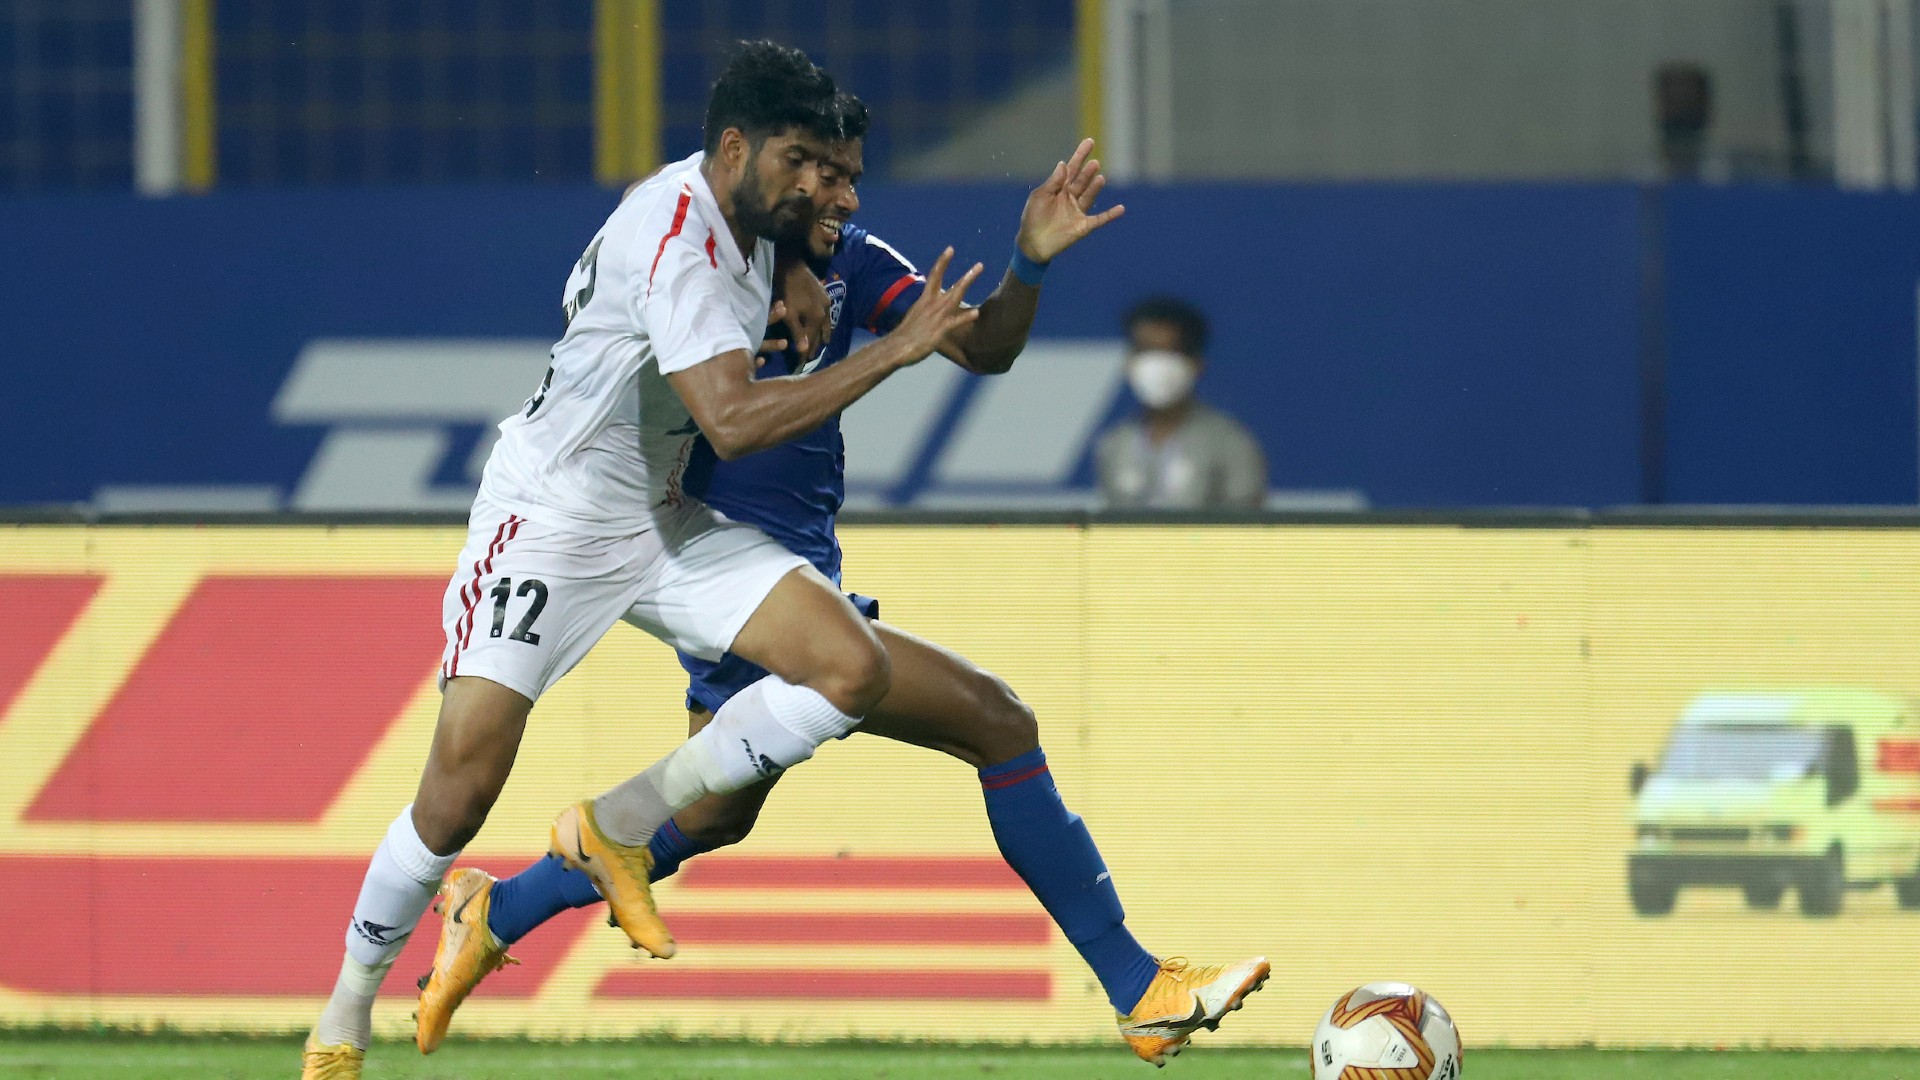 Err and entertain – Unbeaten Bengaluru, NorthEast United do both